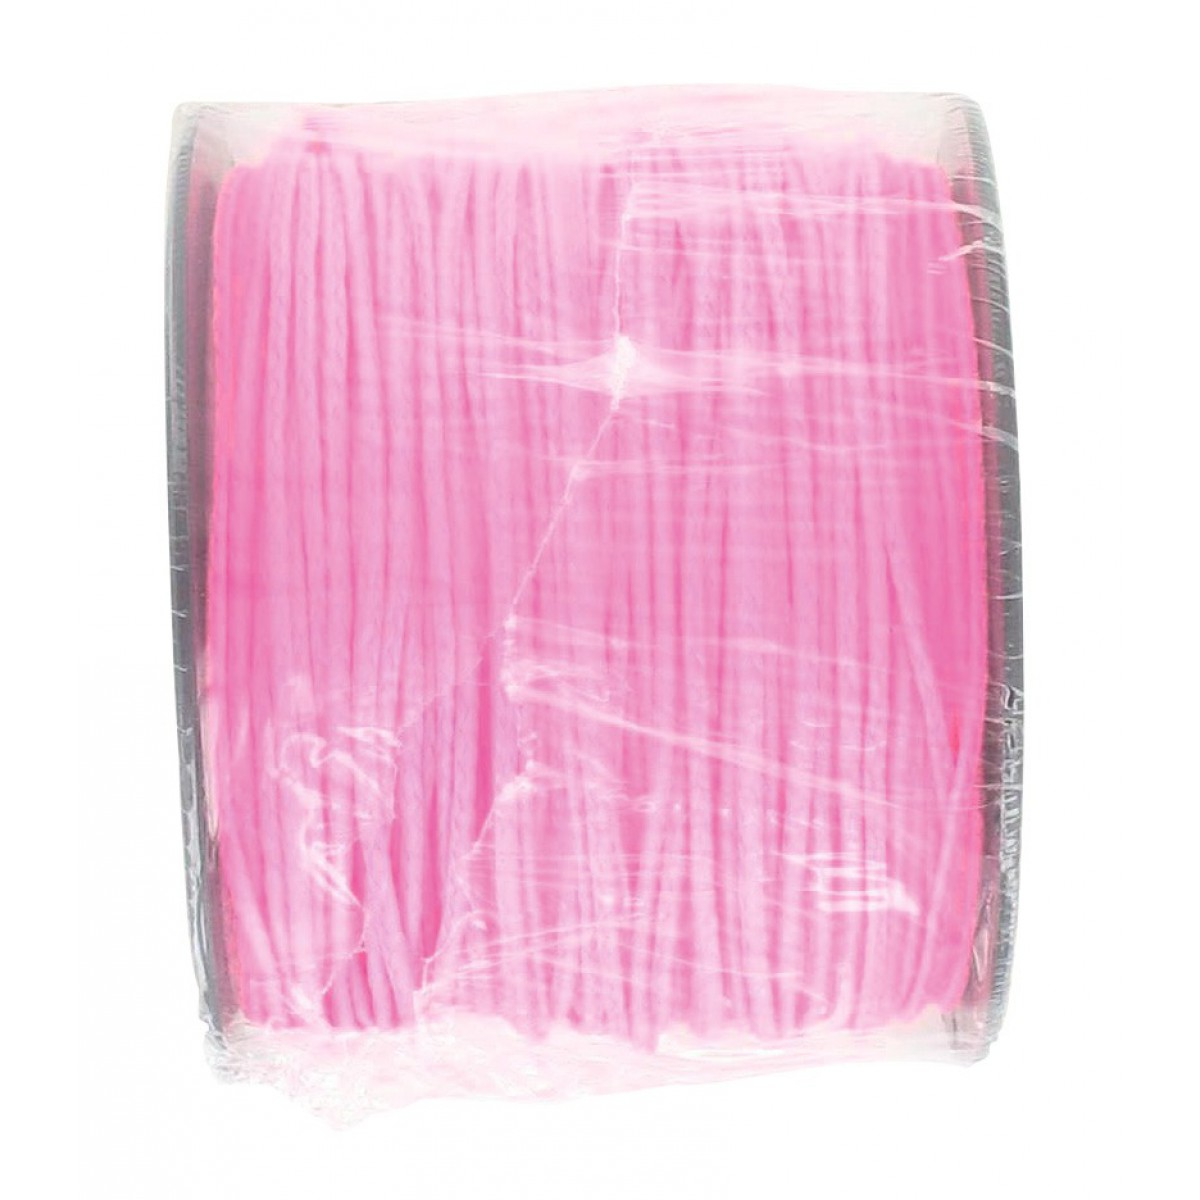 Bobine de tresse polypro rose fluo Outibat - Longueur 100 m - Diamètre 1,5 mm